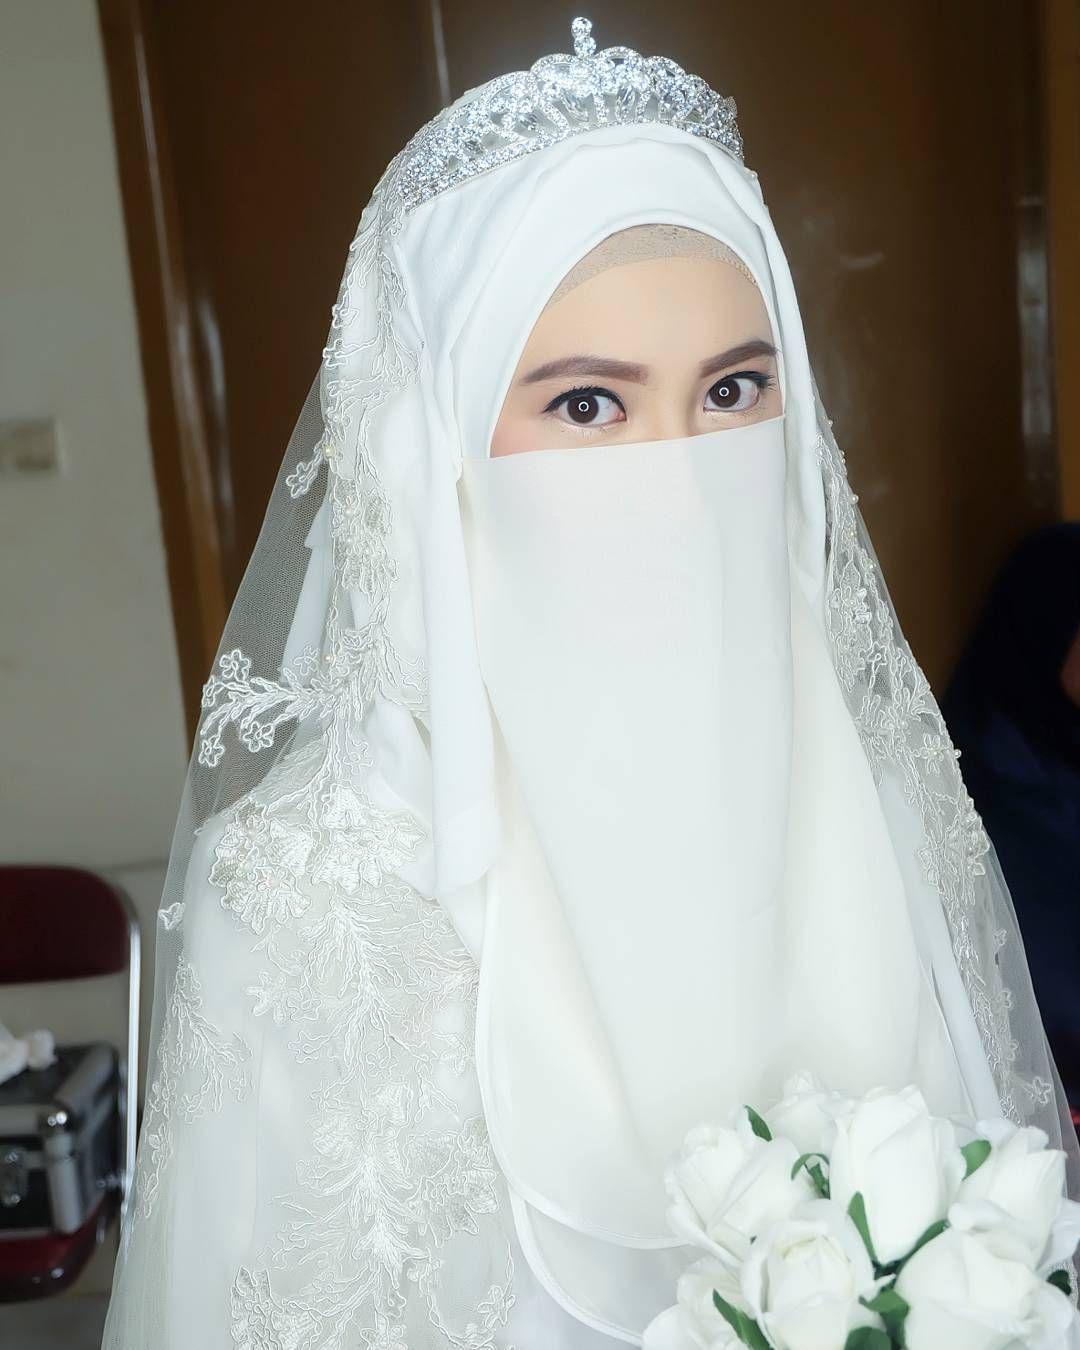 Akad Nikah Teh Shannaz Makeup And Hijab Syar I As Requested A Very